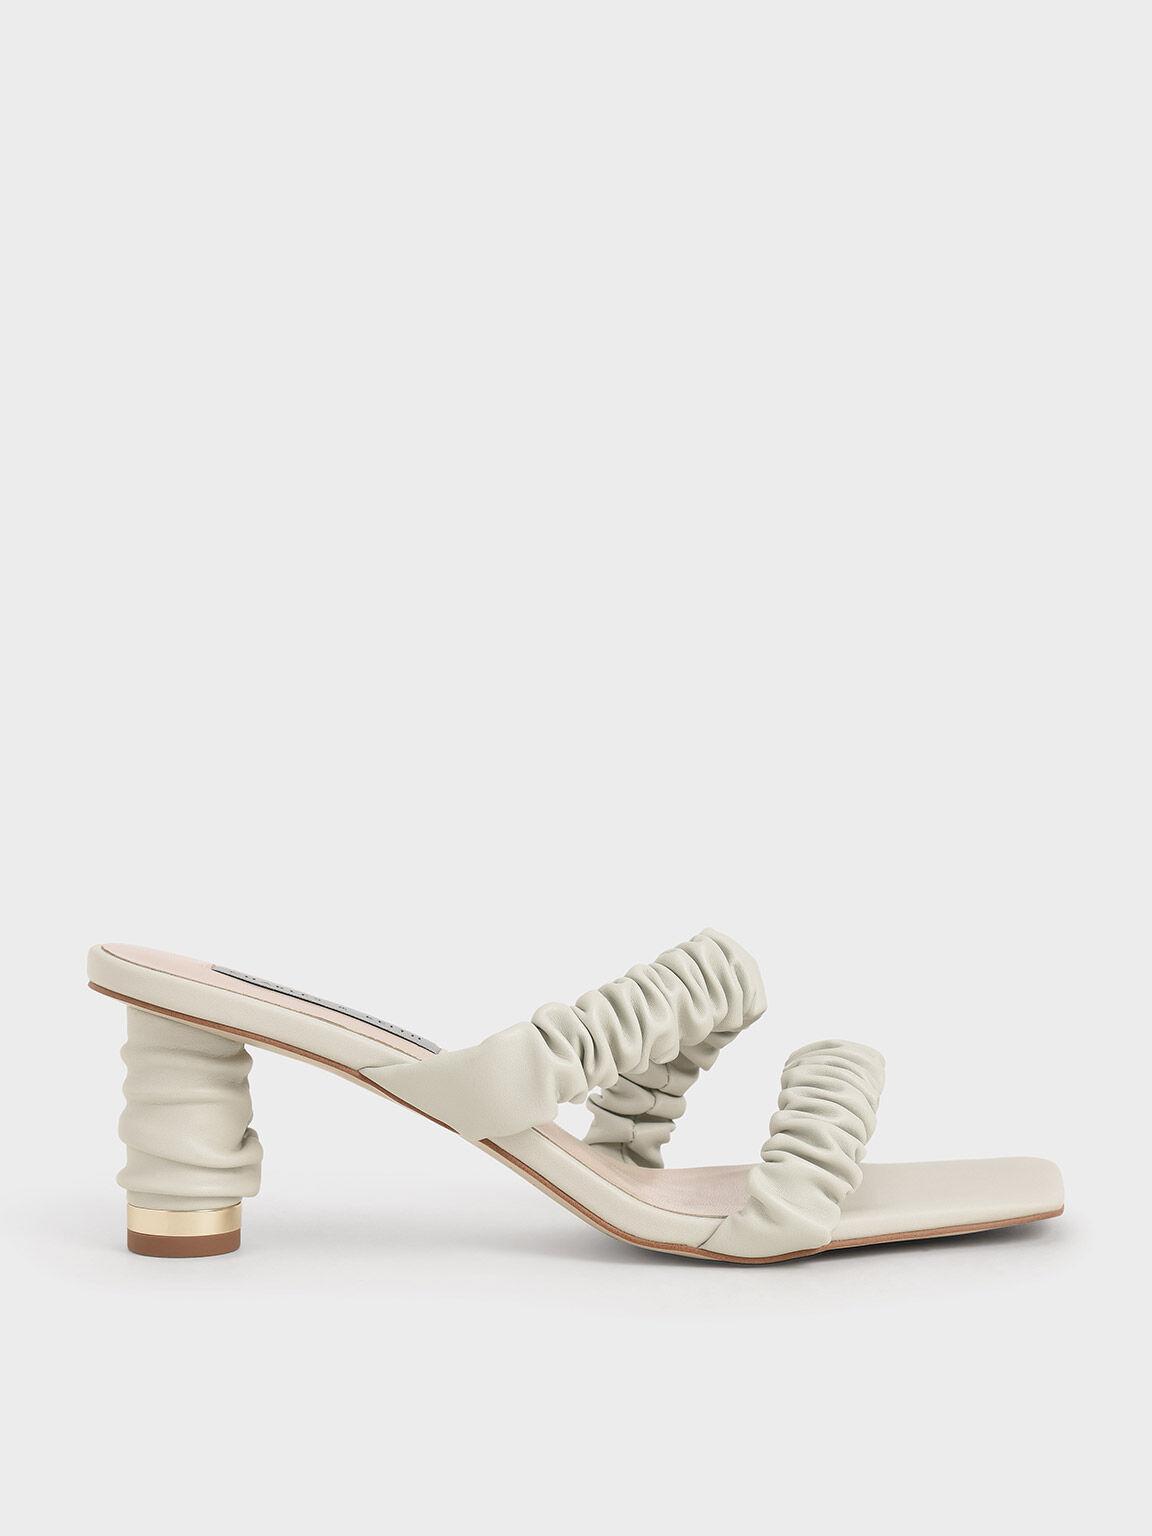 Sandal Ruched Strap Mules, White, hi-res